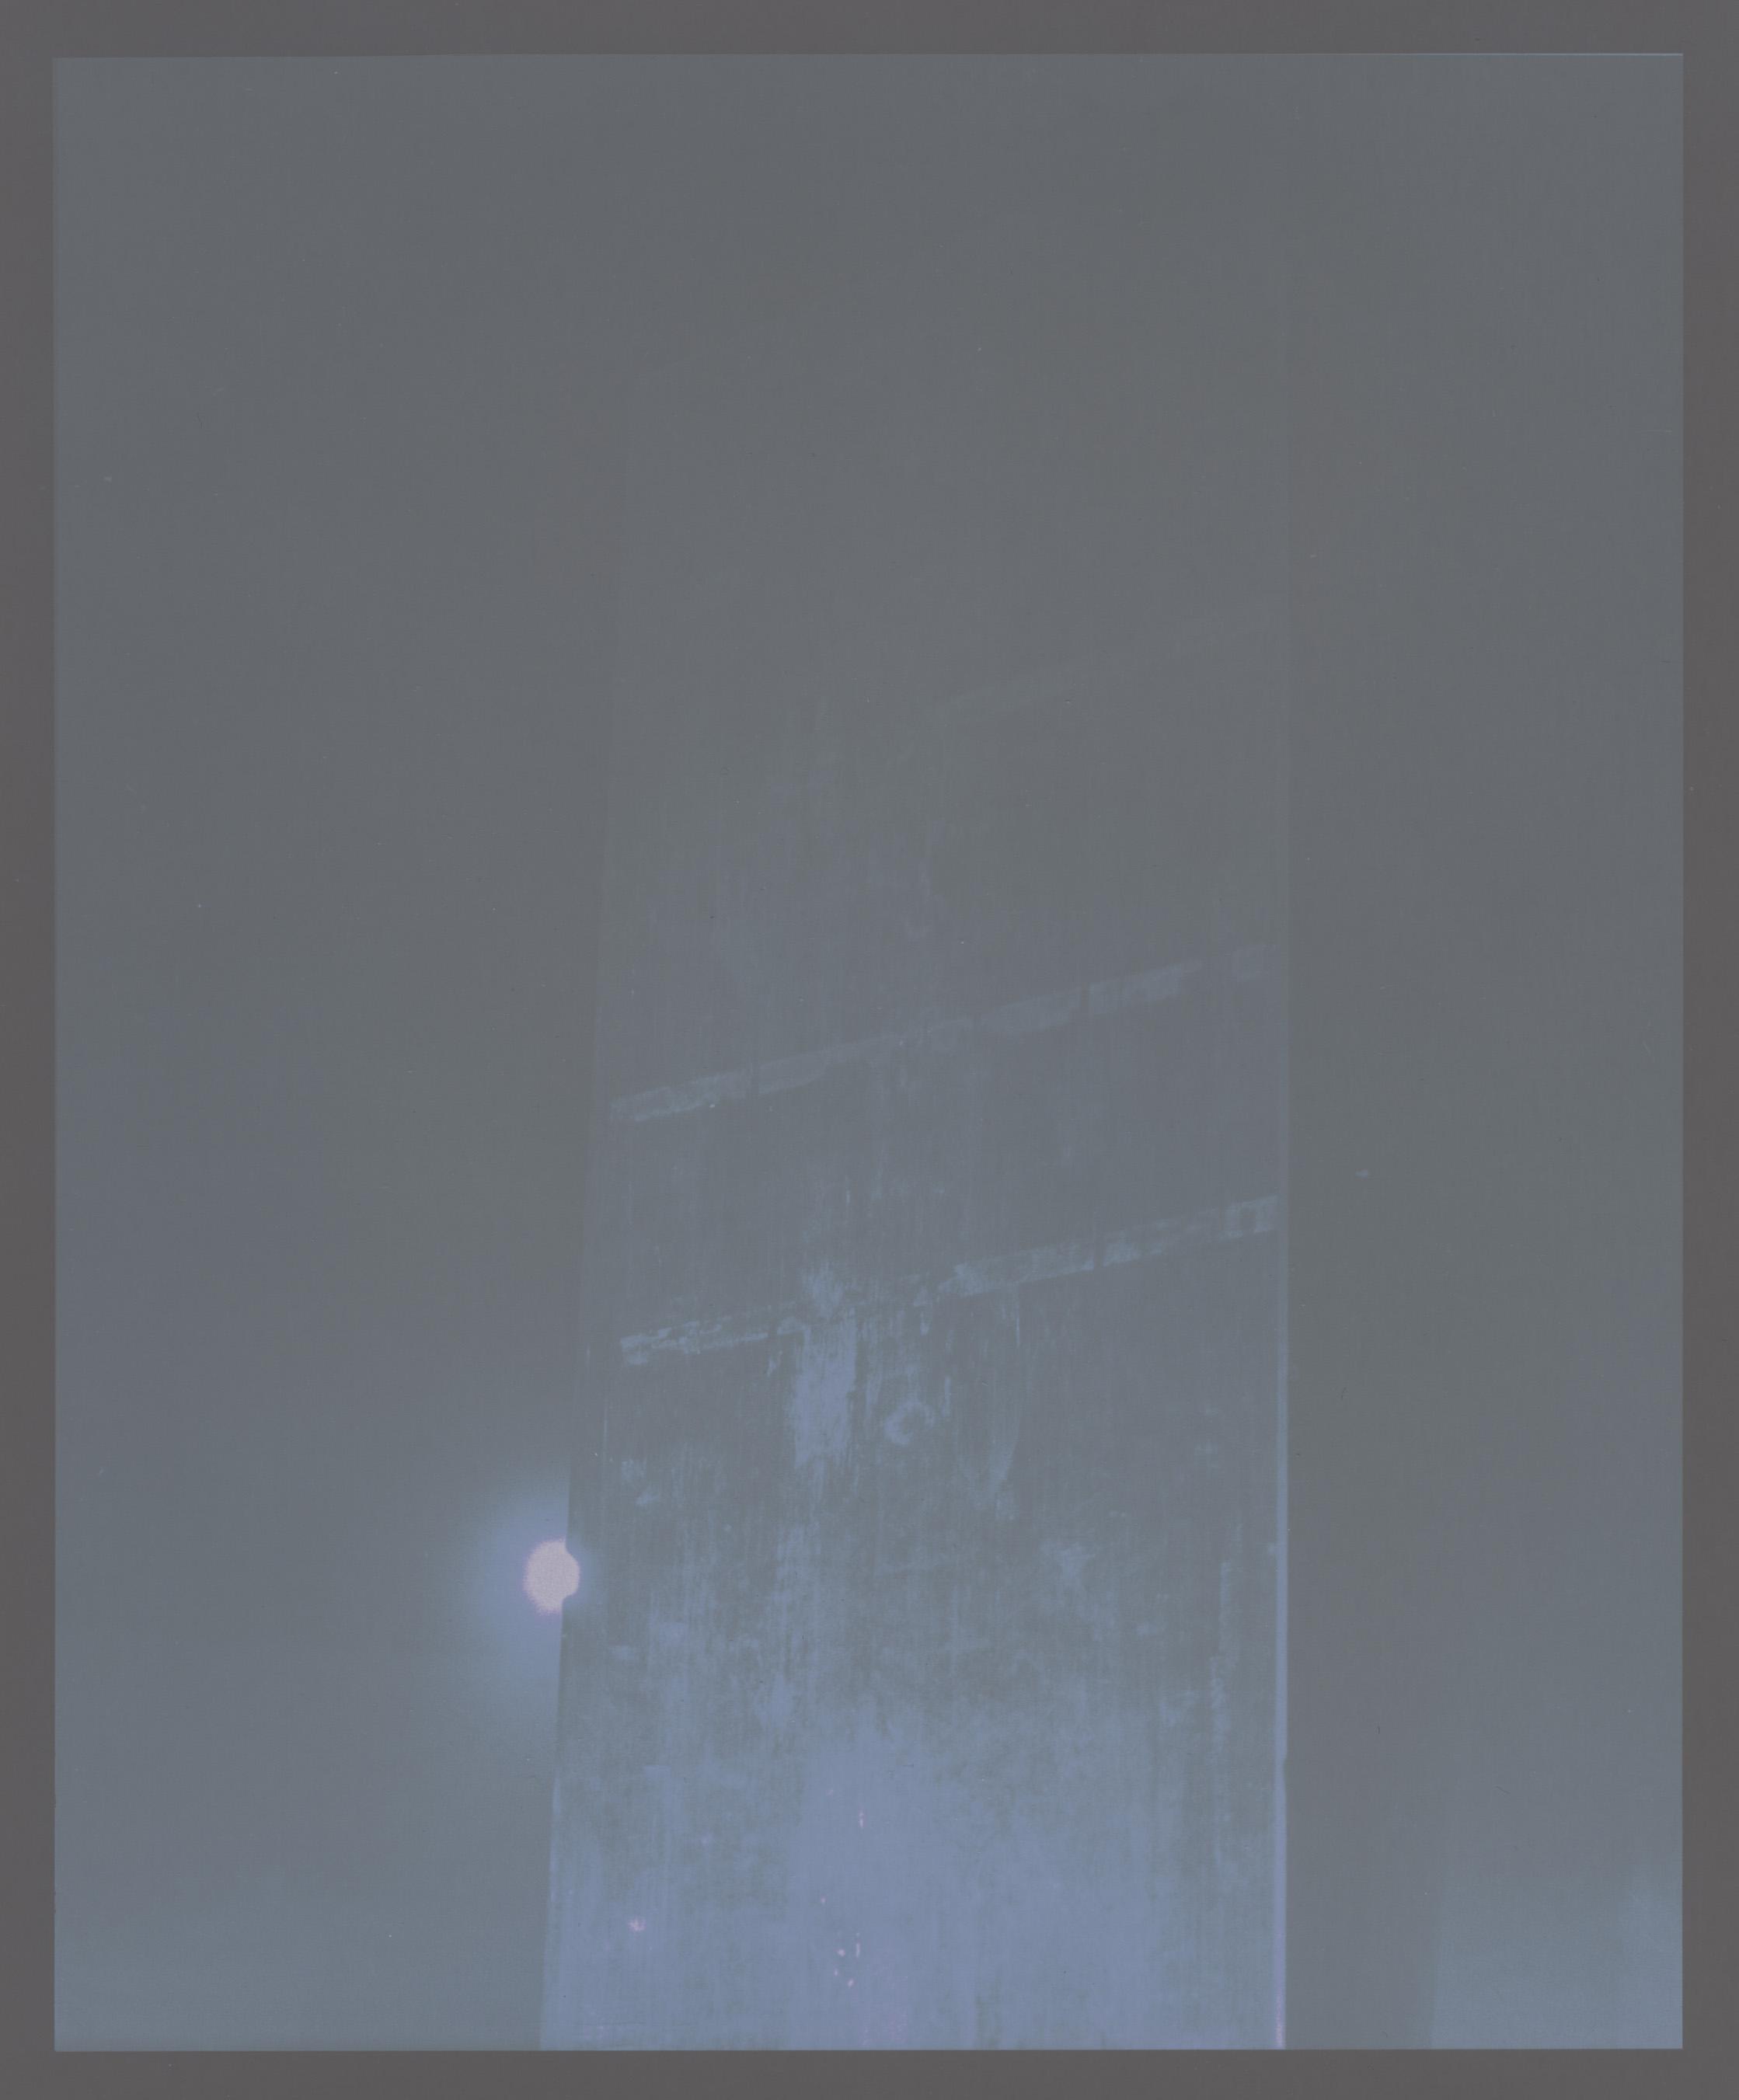 monolith_Moon_01.jpg